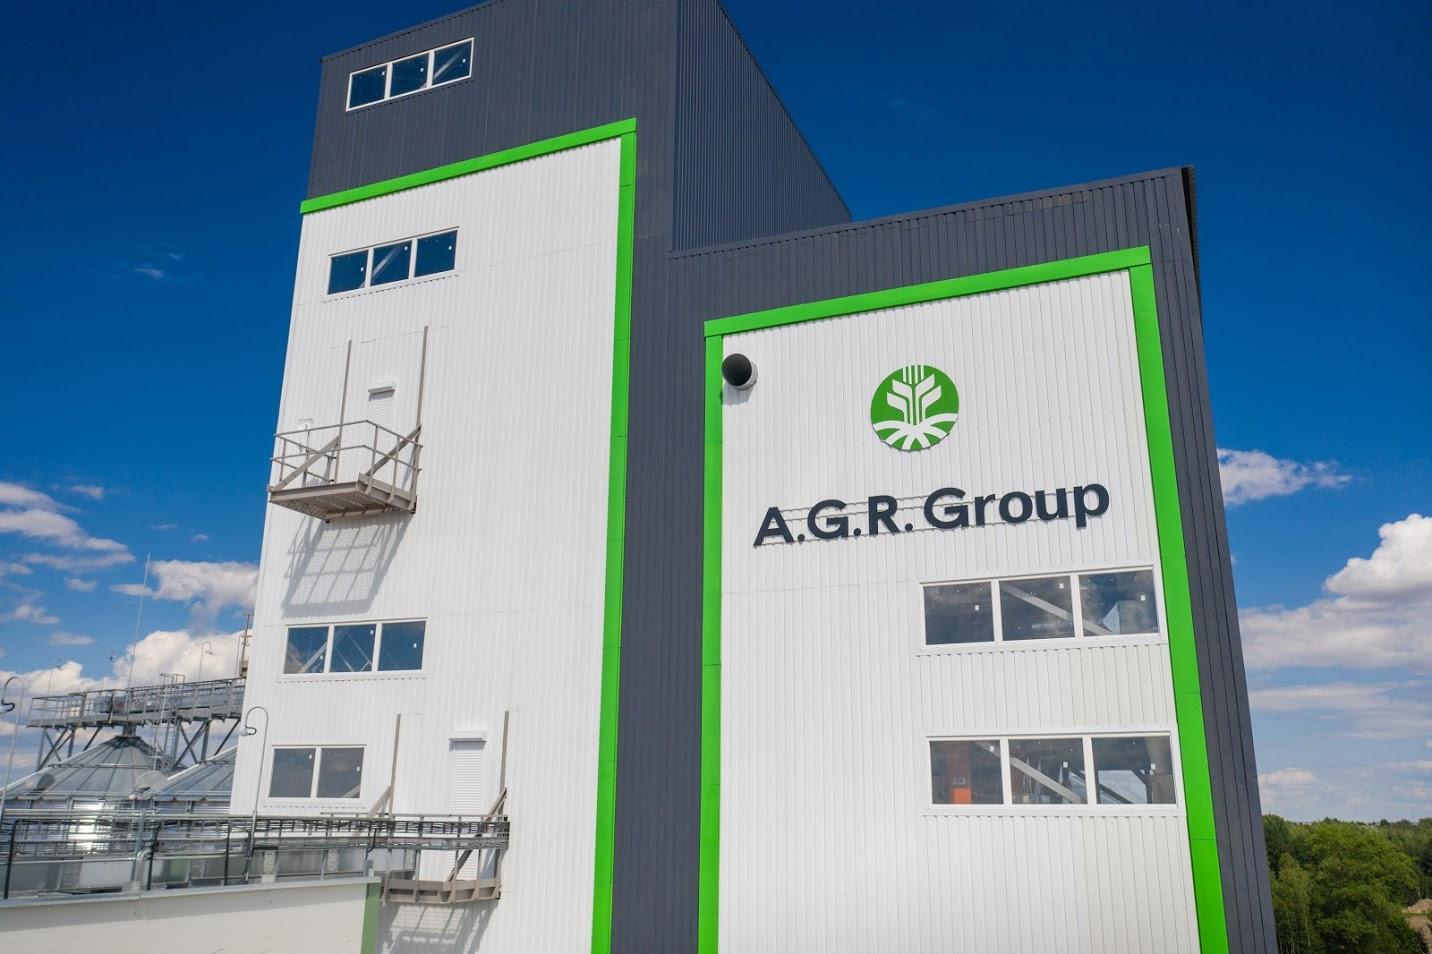 A.G.R.Group.jpg (201 KB)